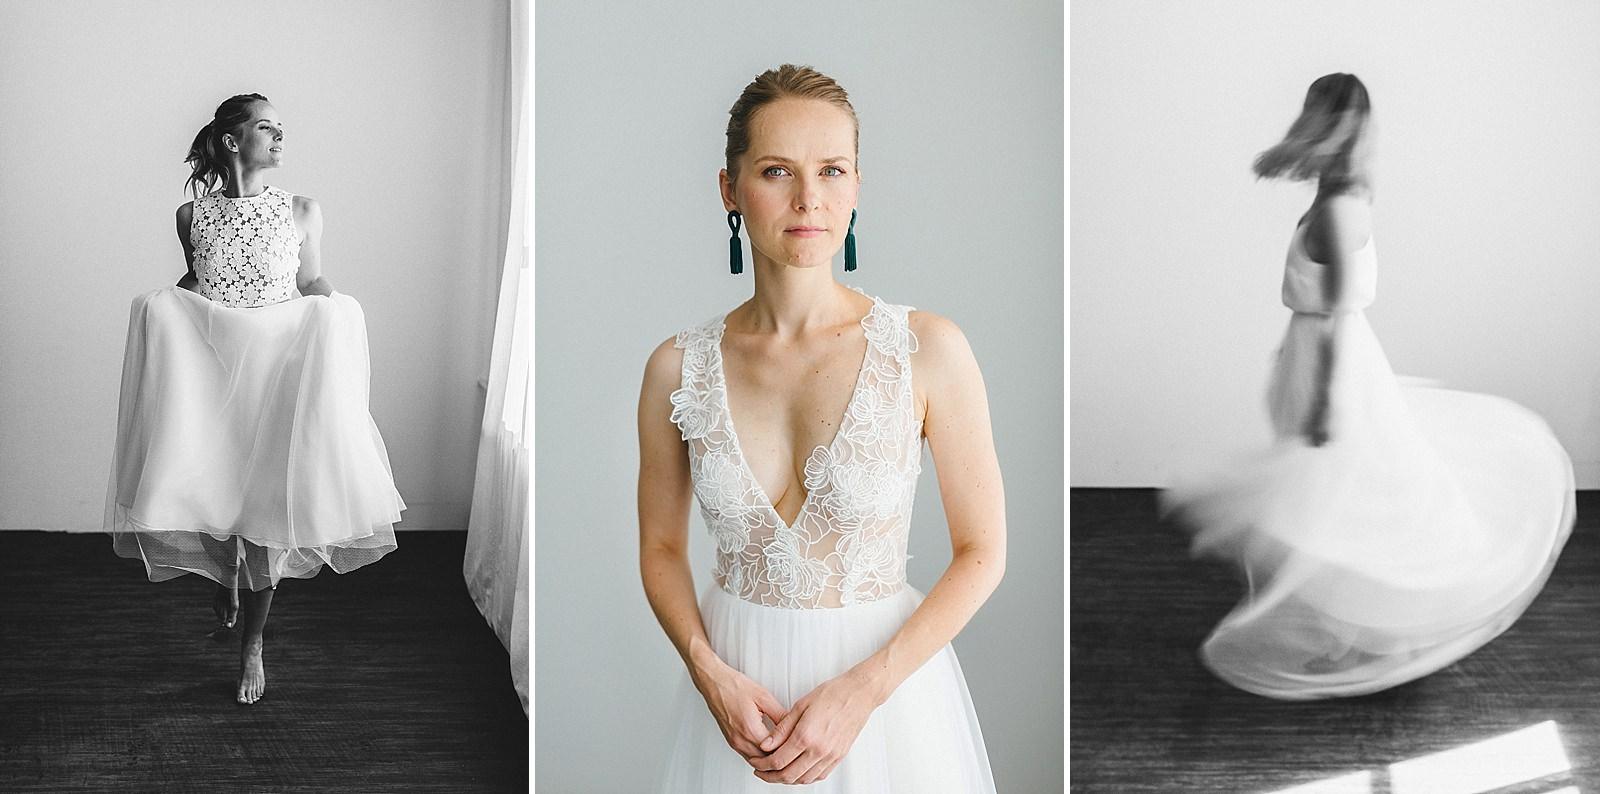 nala-bridal-couture-003.jpg